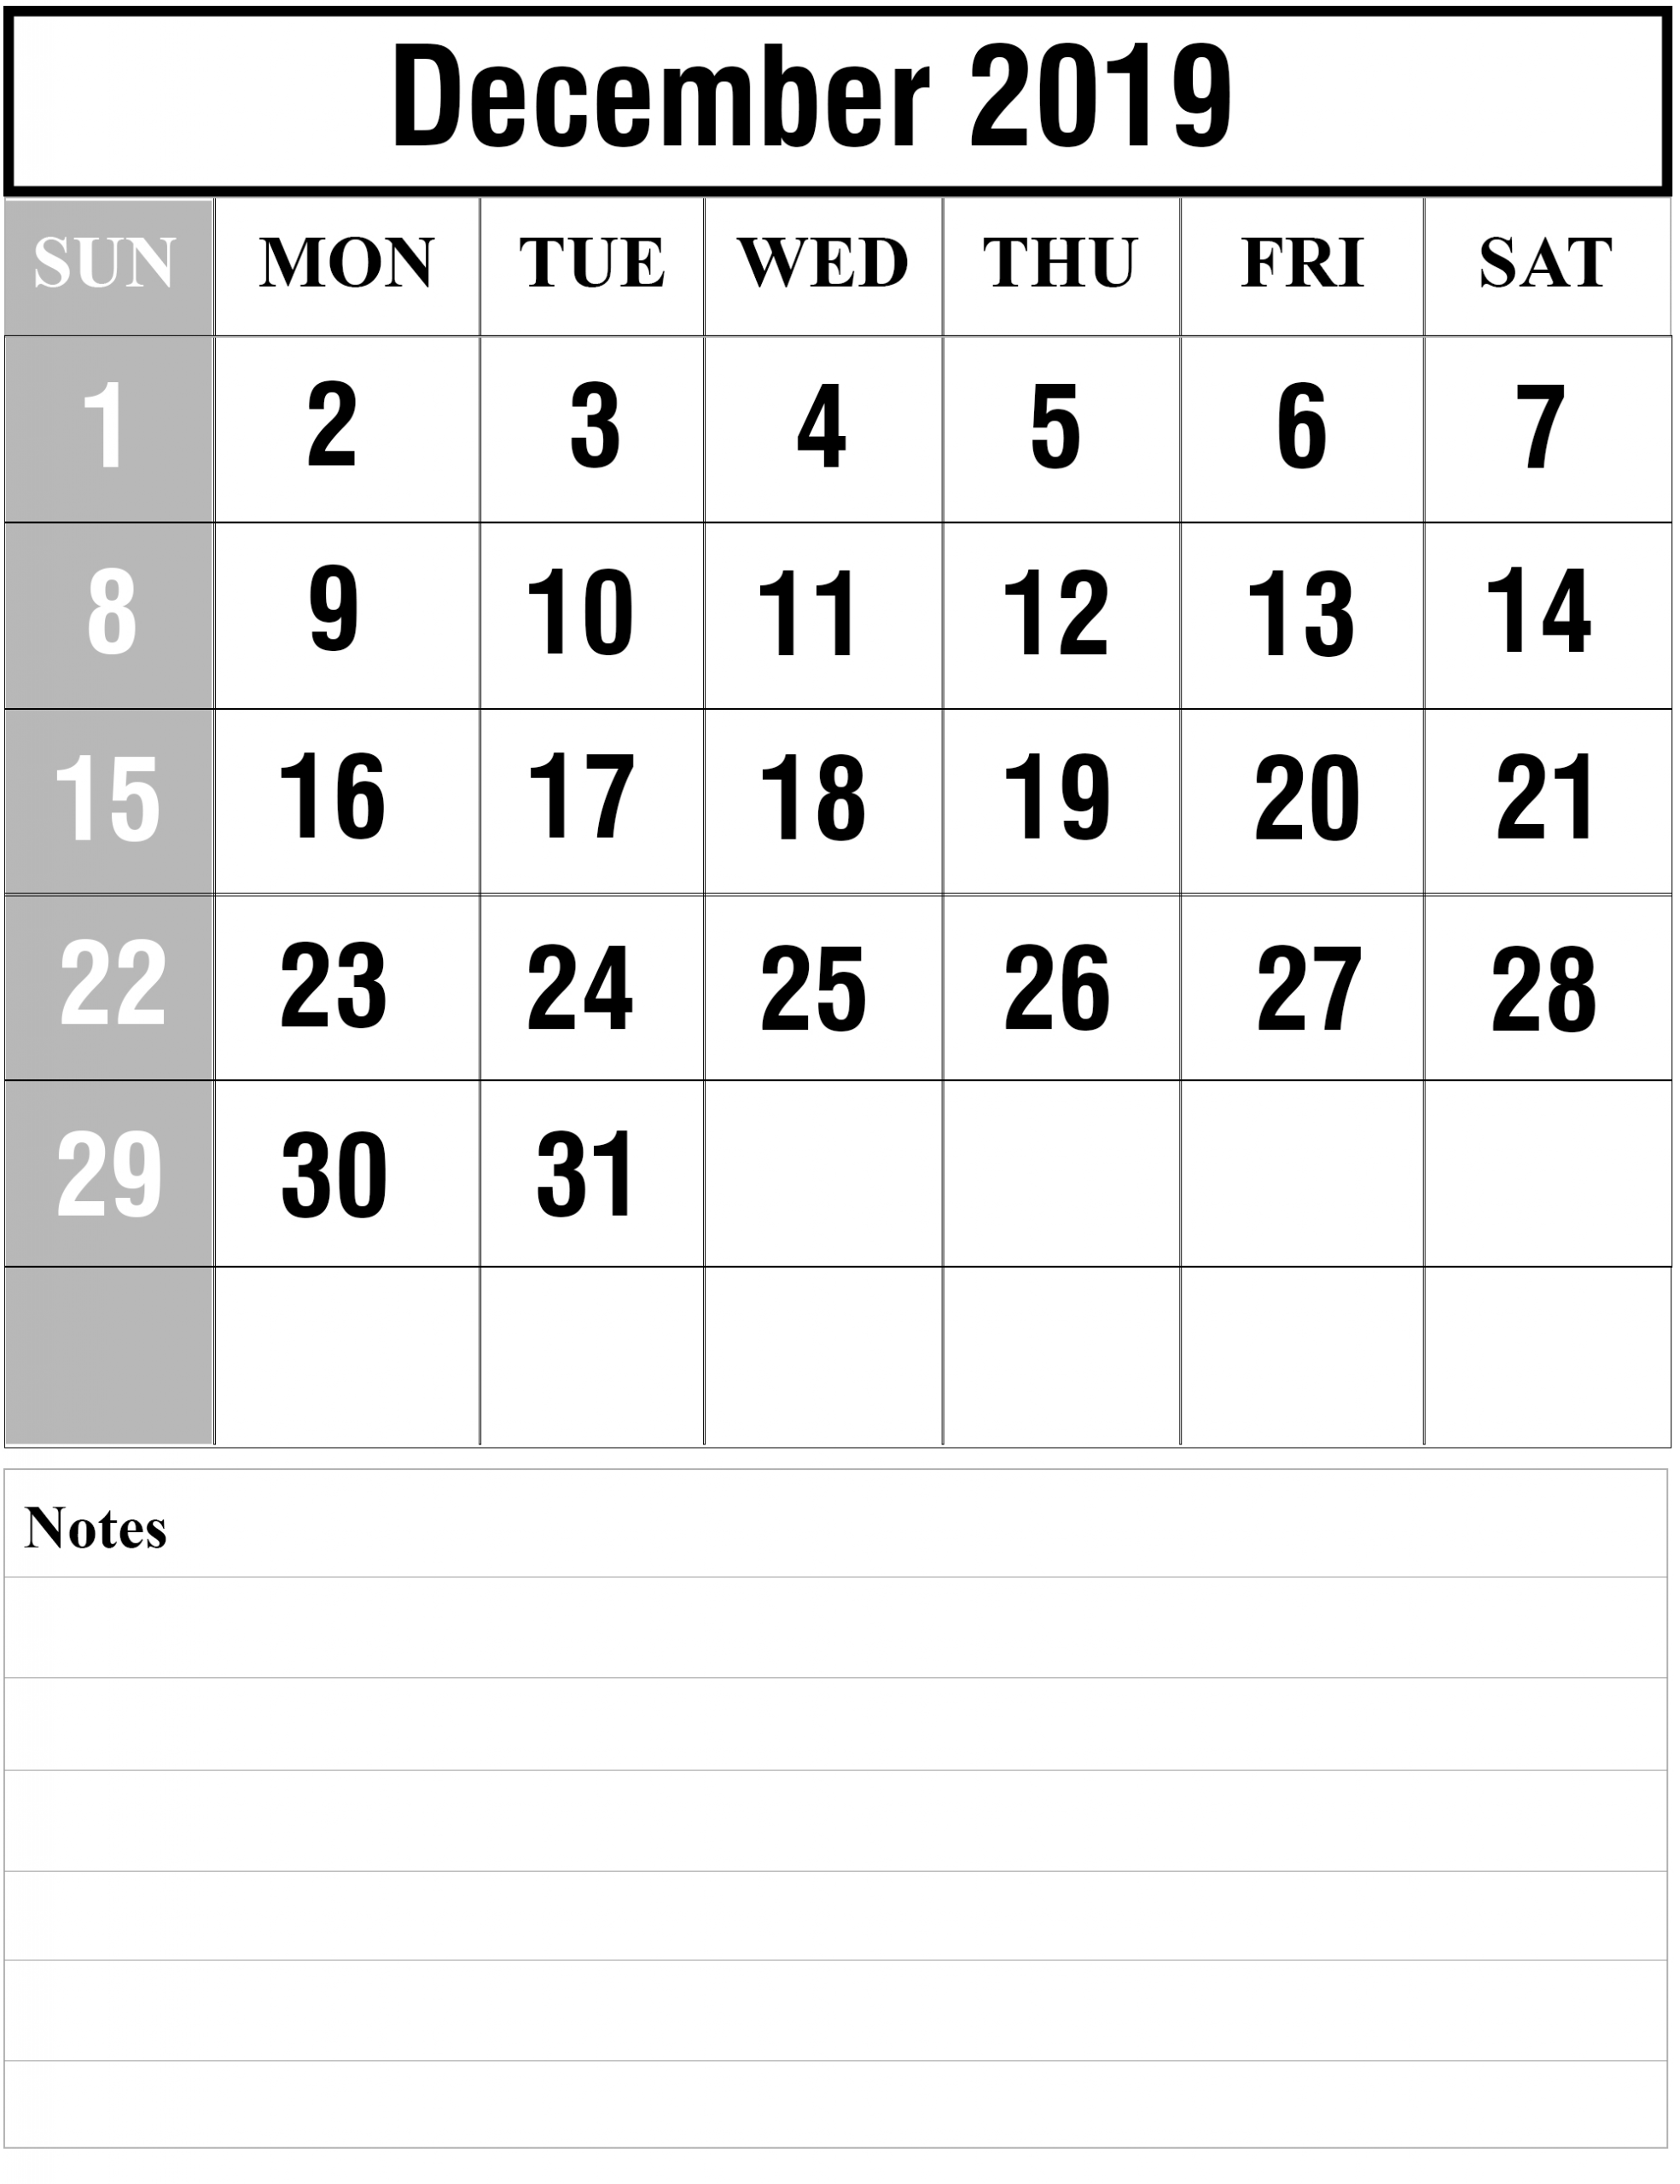 Free Printable Calendar You Can Edit | Calendar Printables Calender That Yopu Can Eedit